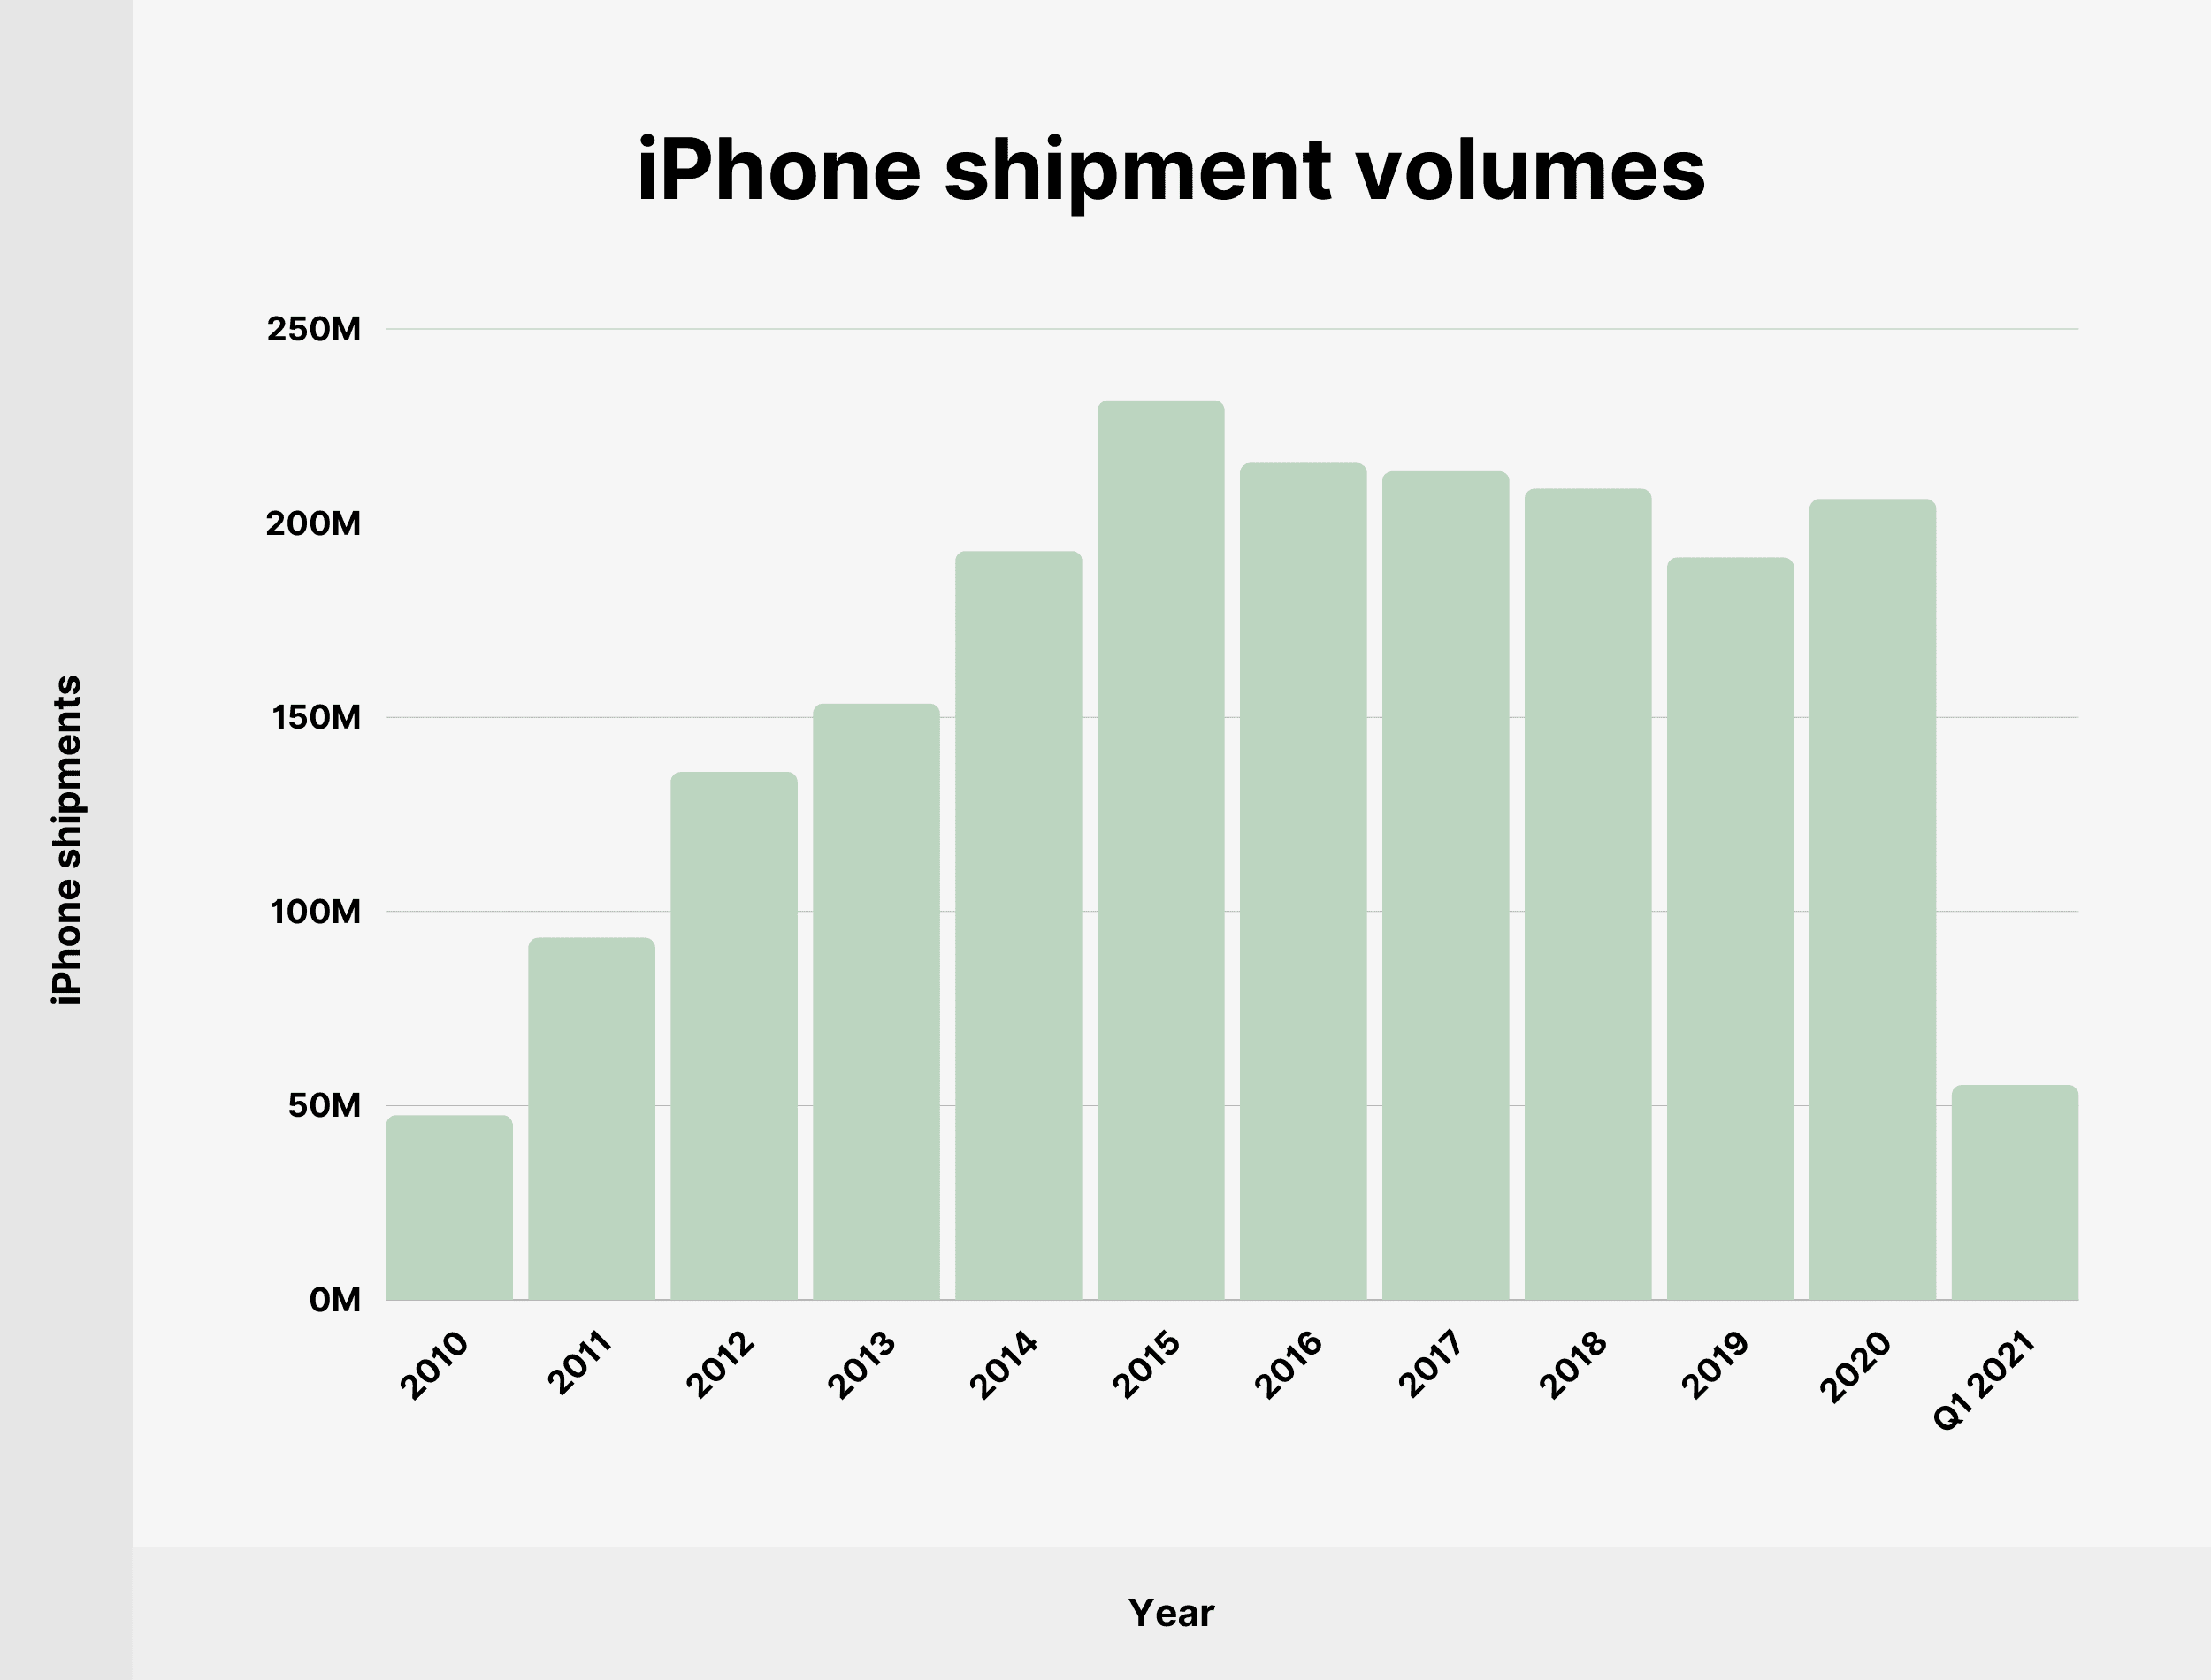 iPhone shipment volumes